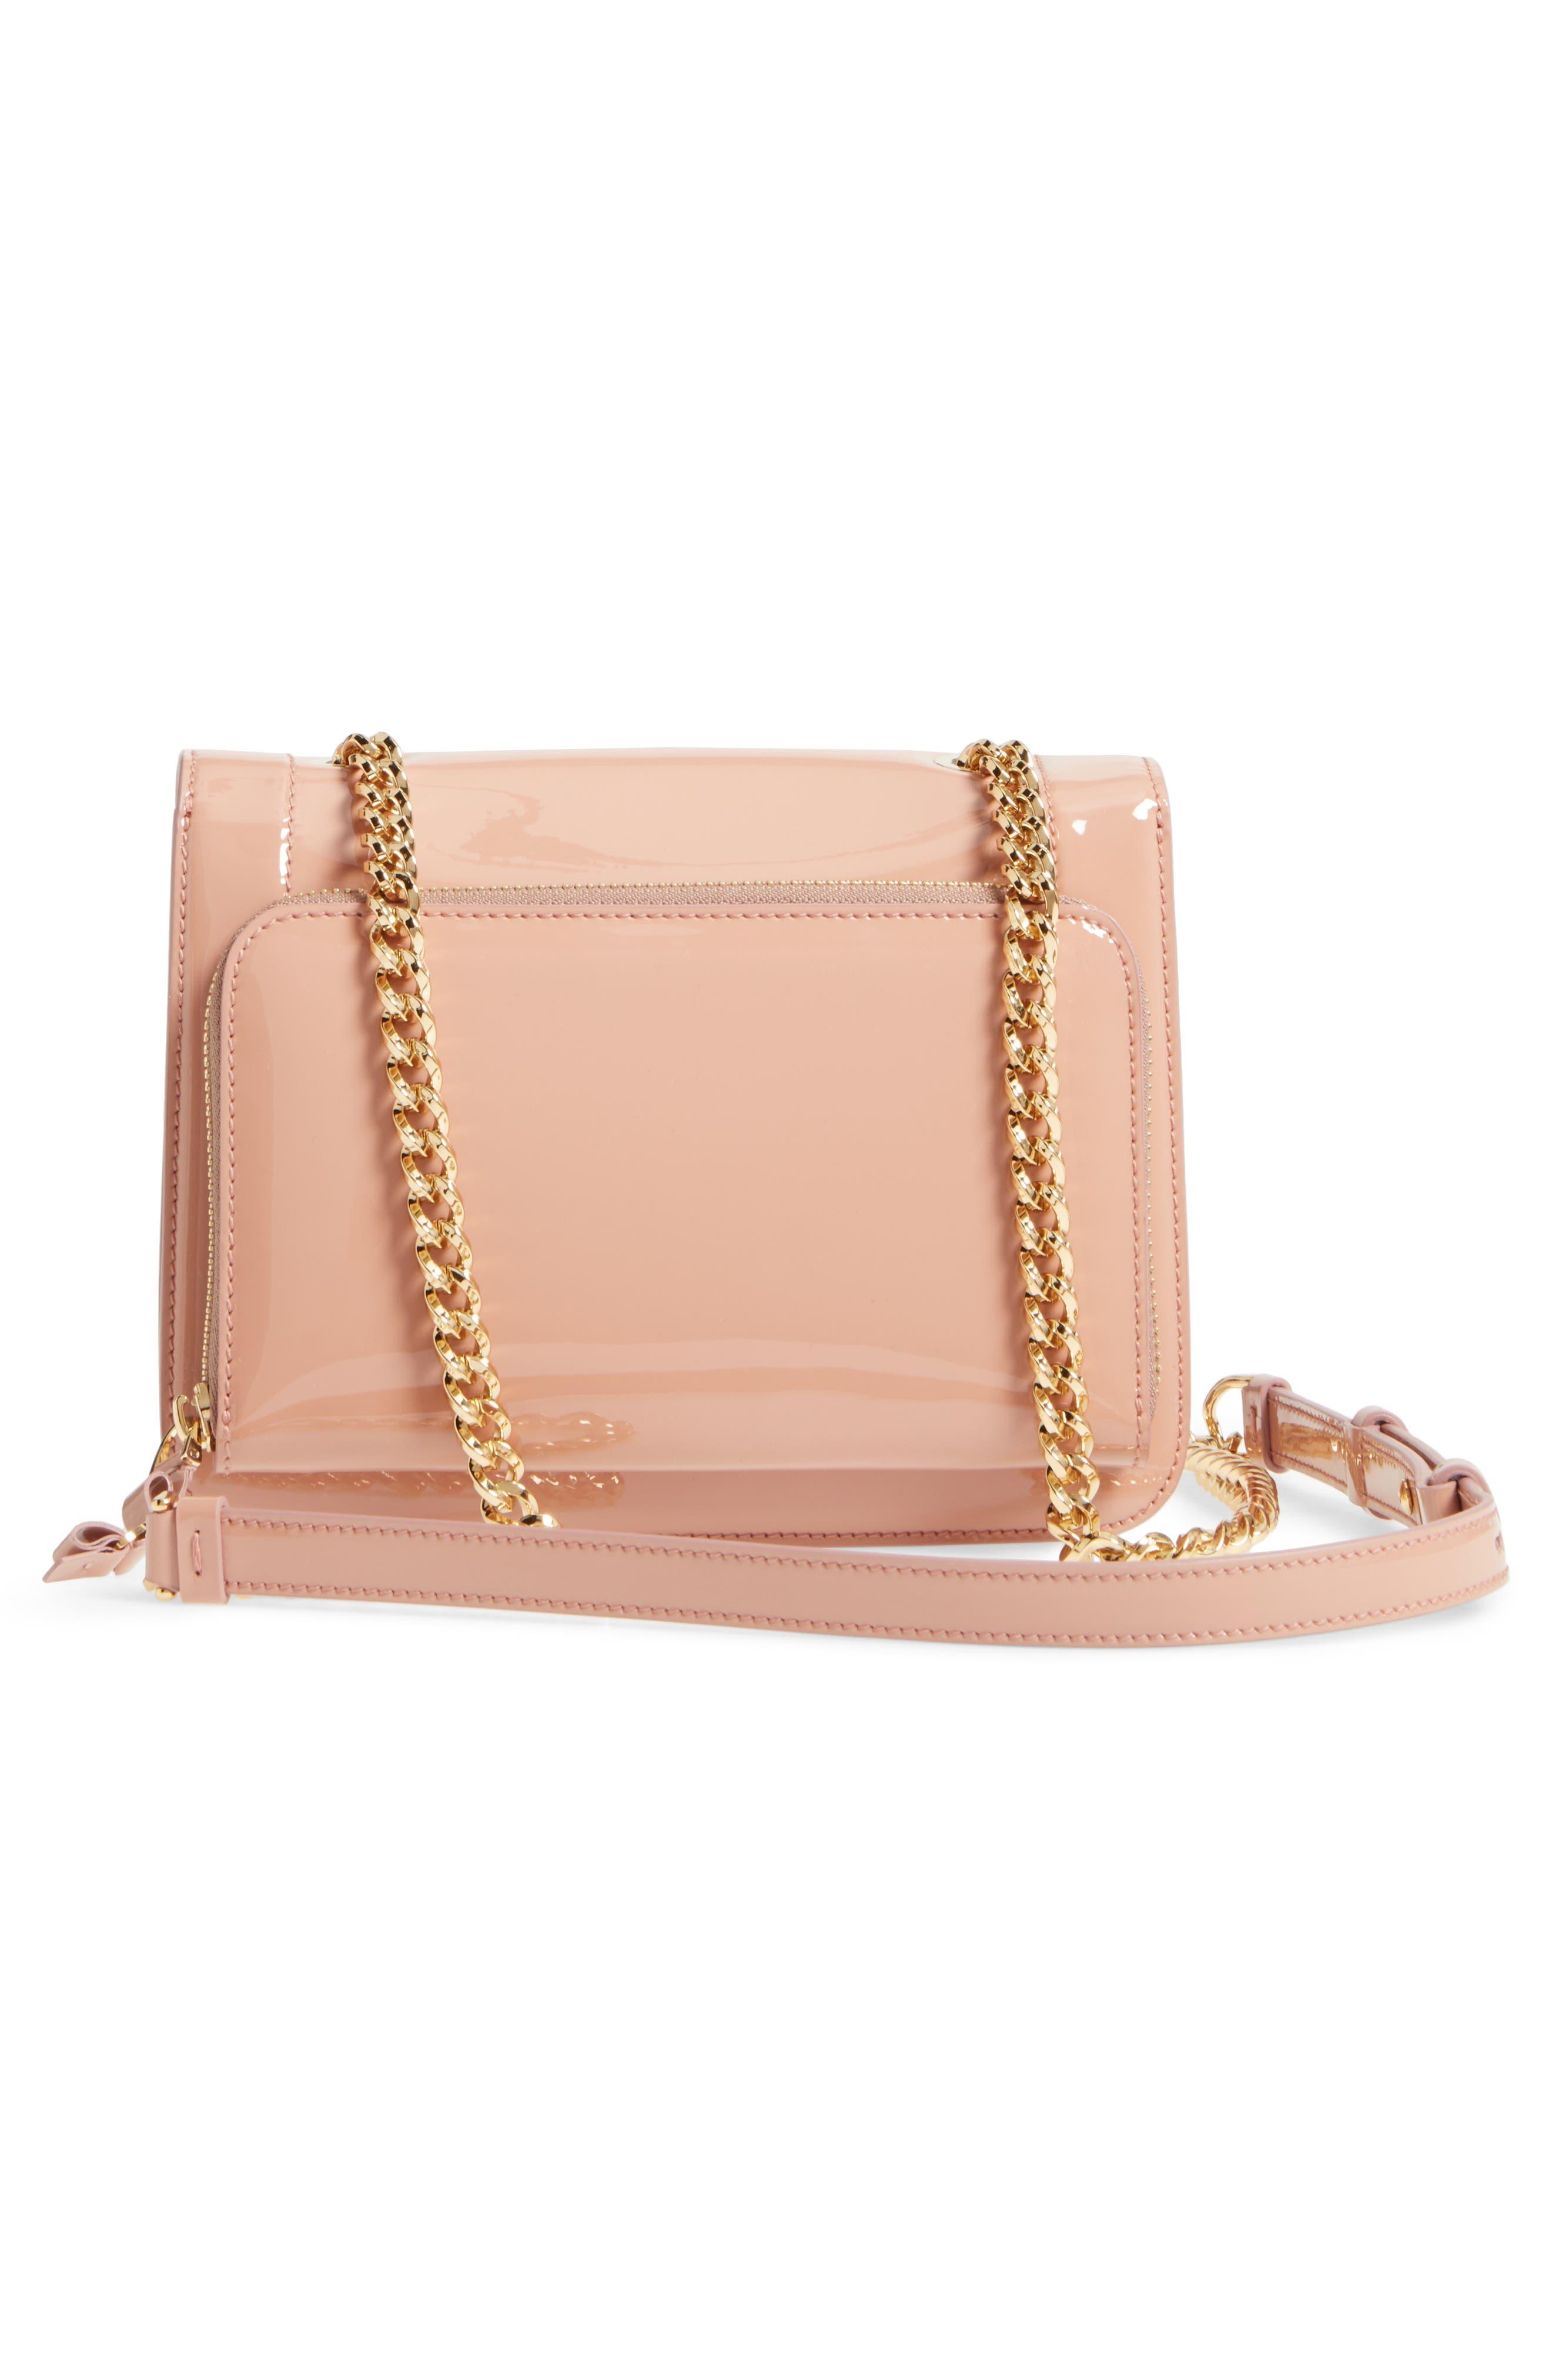 Vara Patent Leather Shoulder Bag,                             Alternate thumbnail 3, color,                             NEW BLUSH/ BONBON